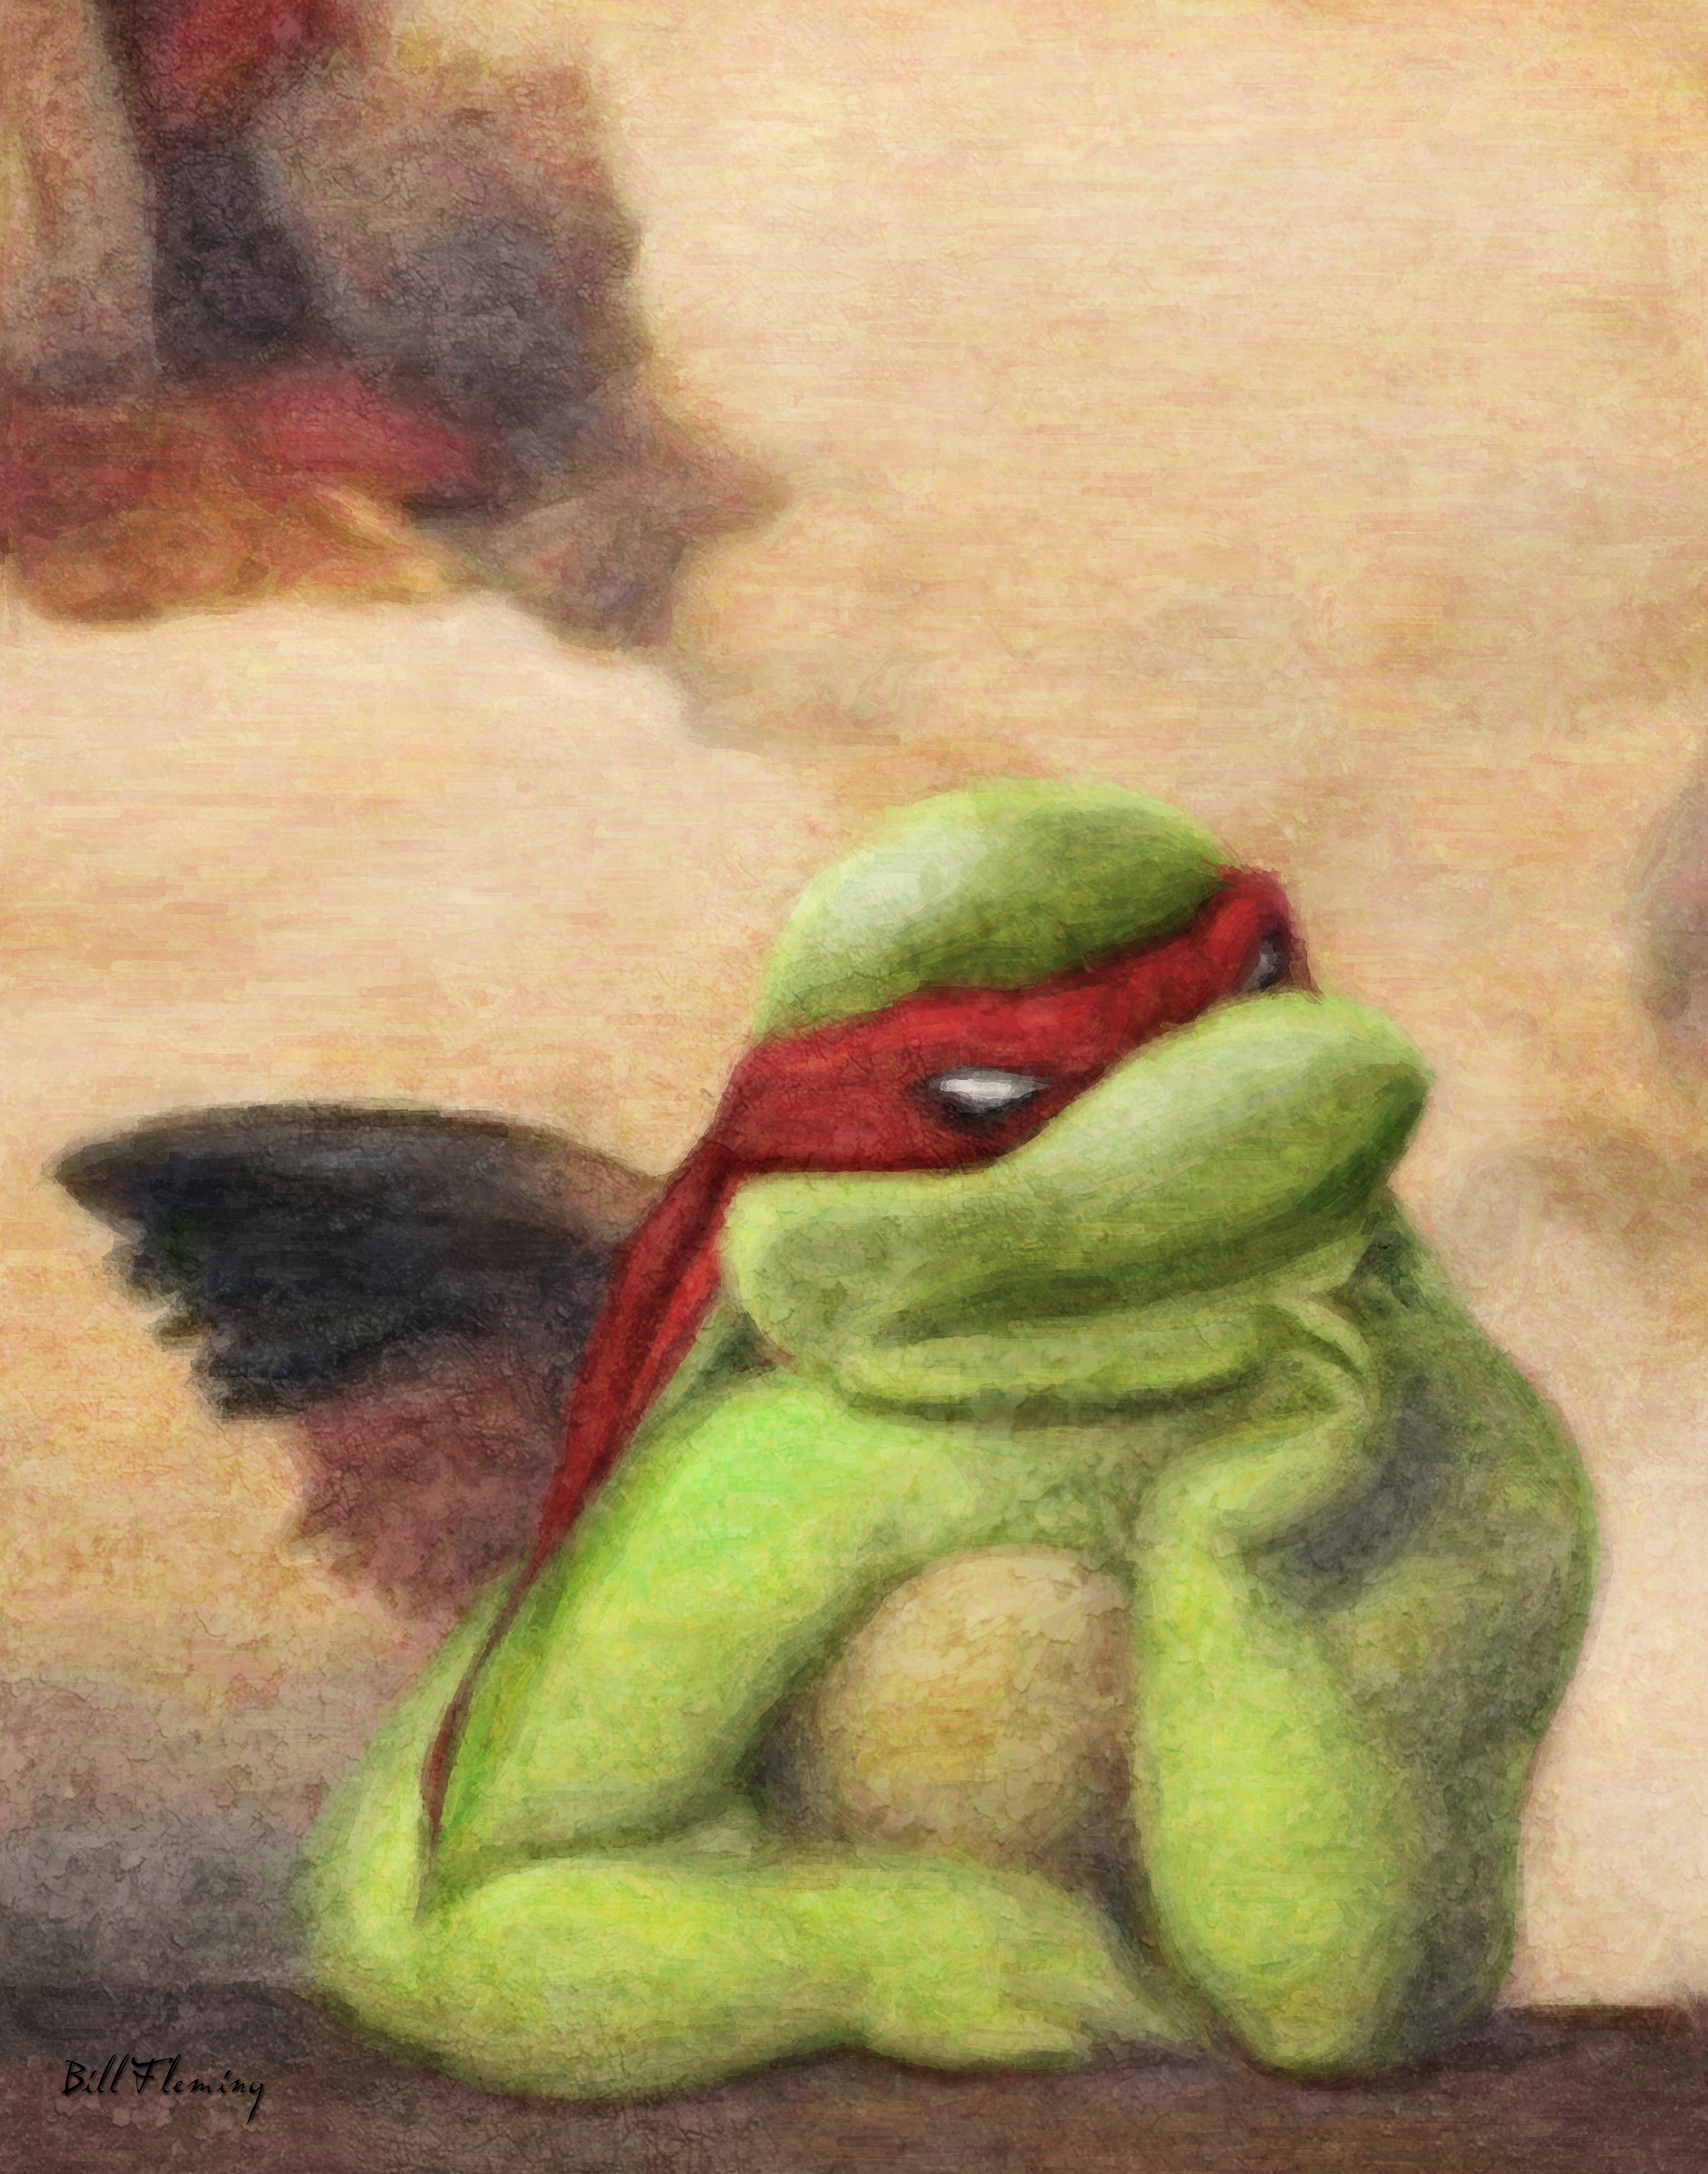 Raphael by KomodoEmpire